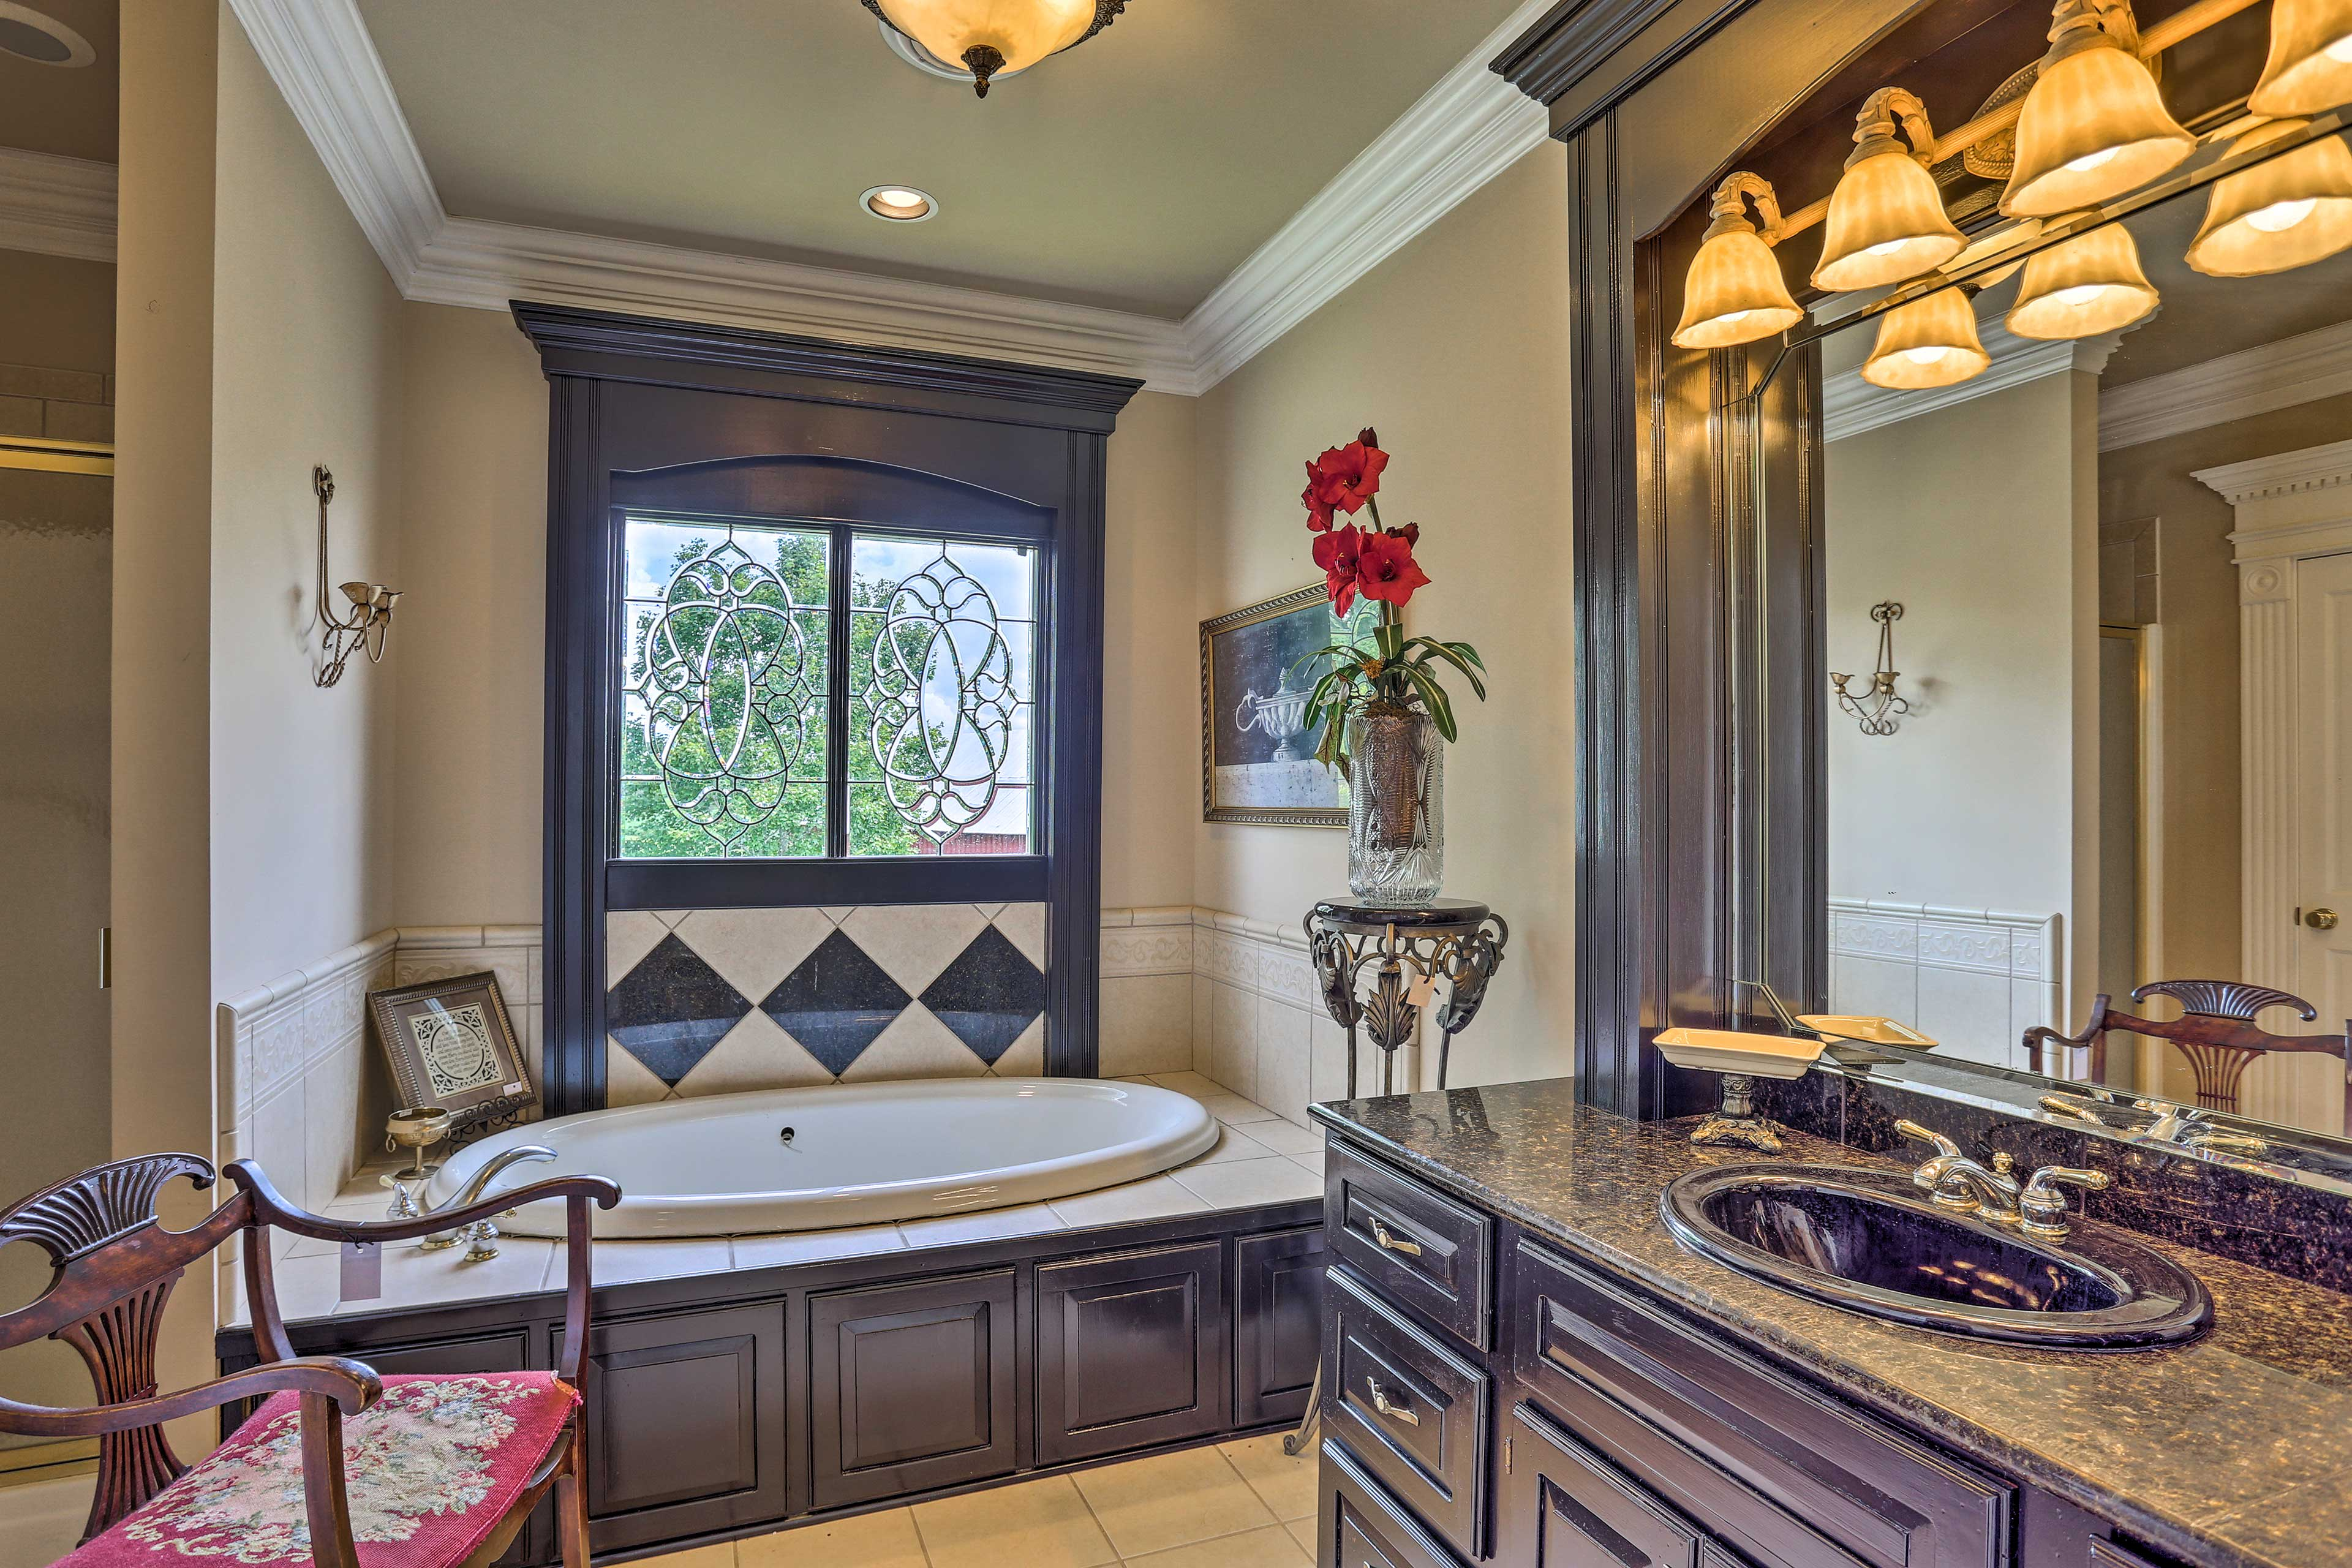 This bathroom also has a soaking tub!